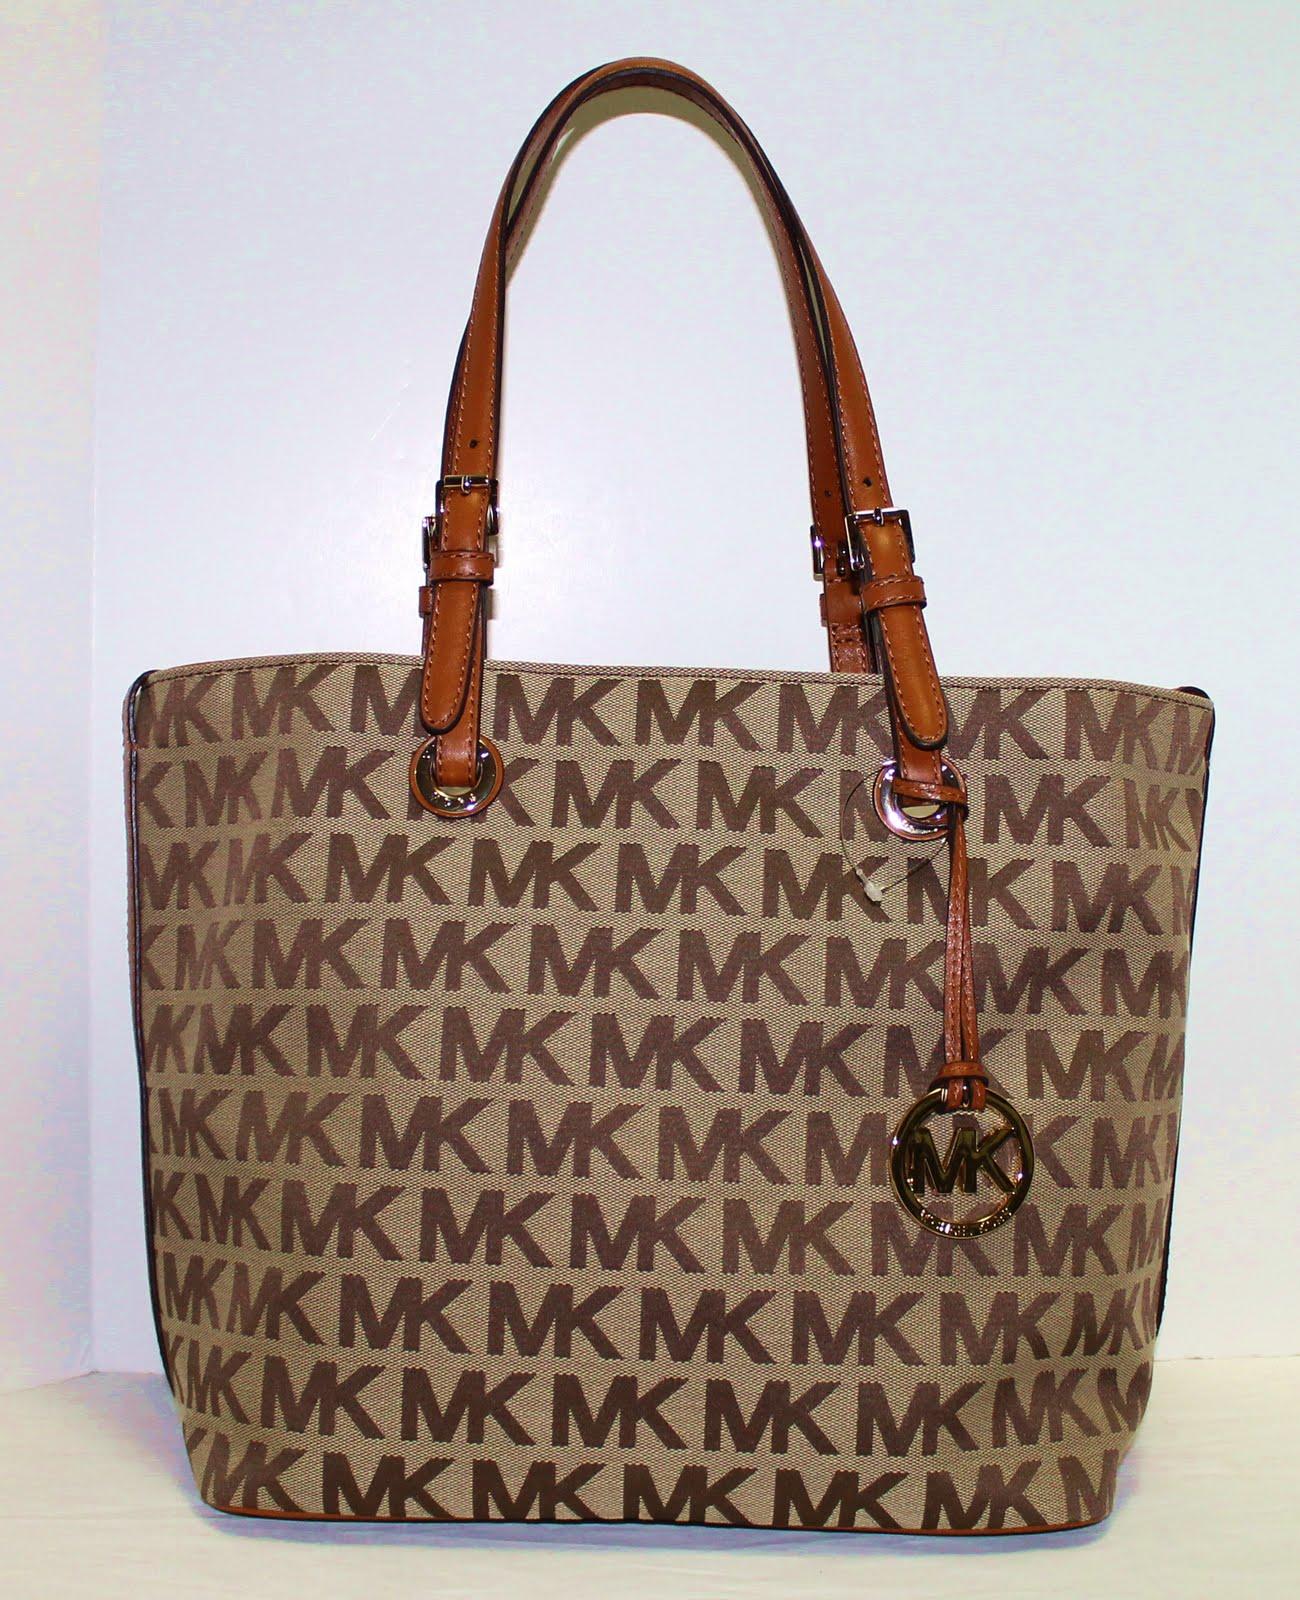 2f499c7f2122e8 Michael Kors Handbags Malaysia Sale | Stanford Center for ...